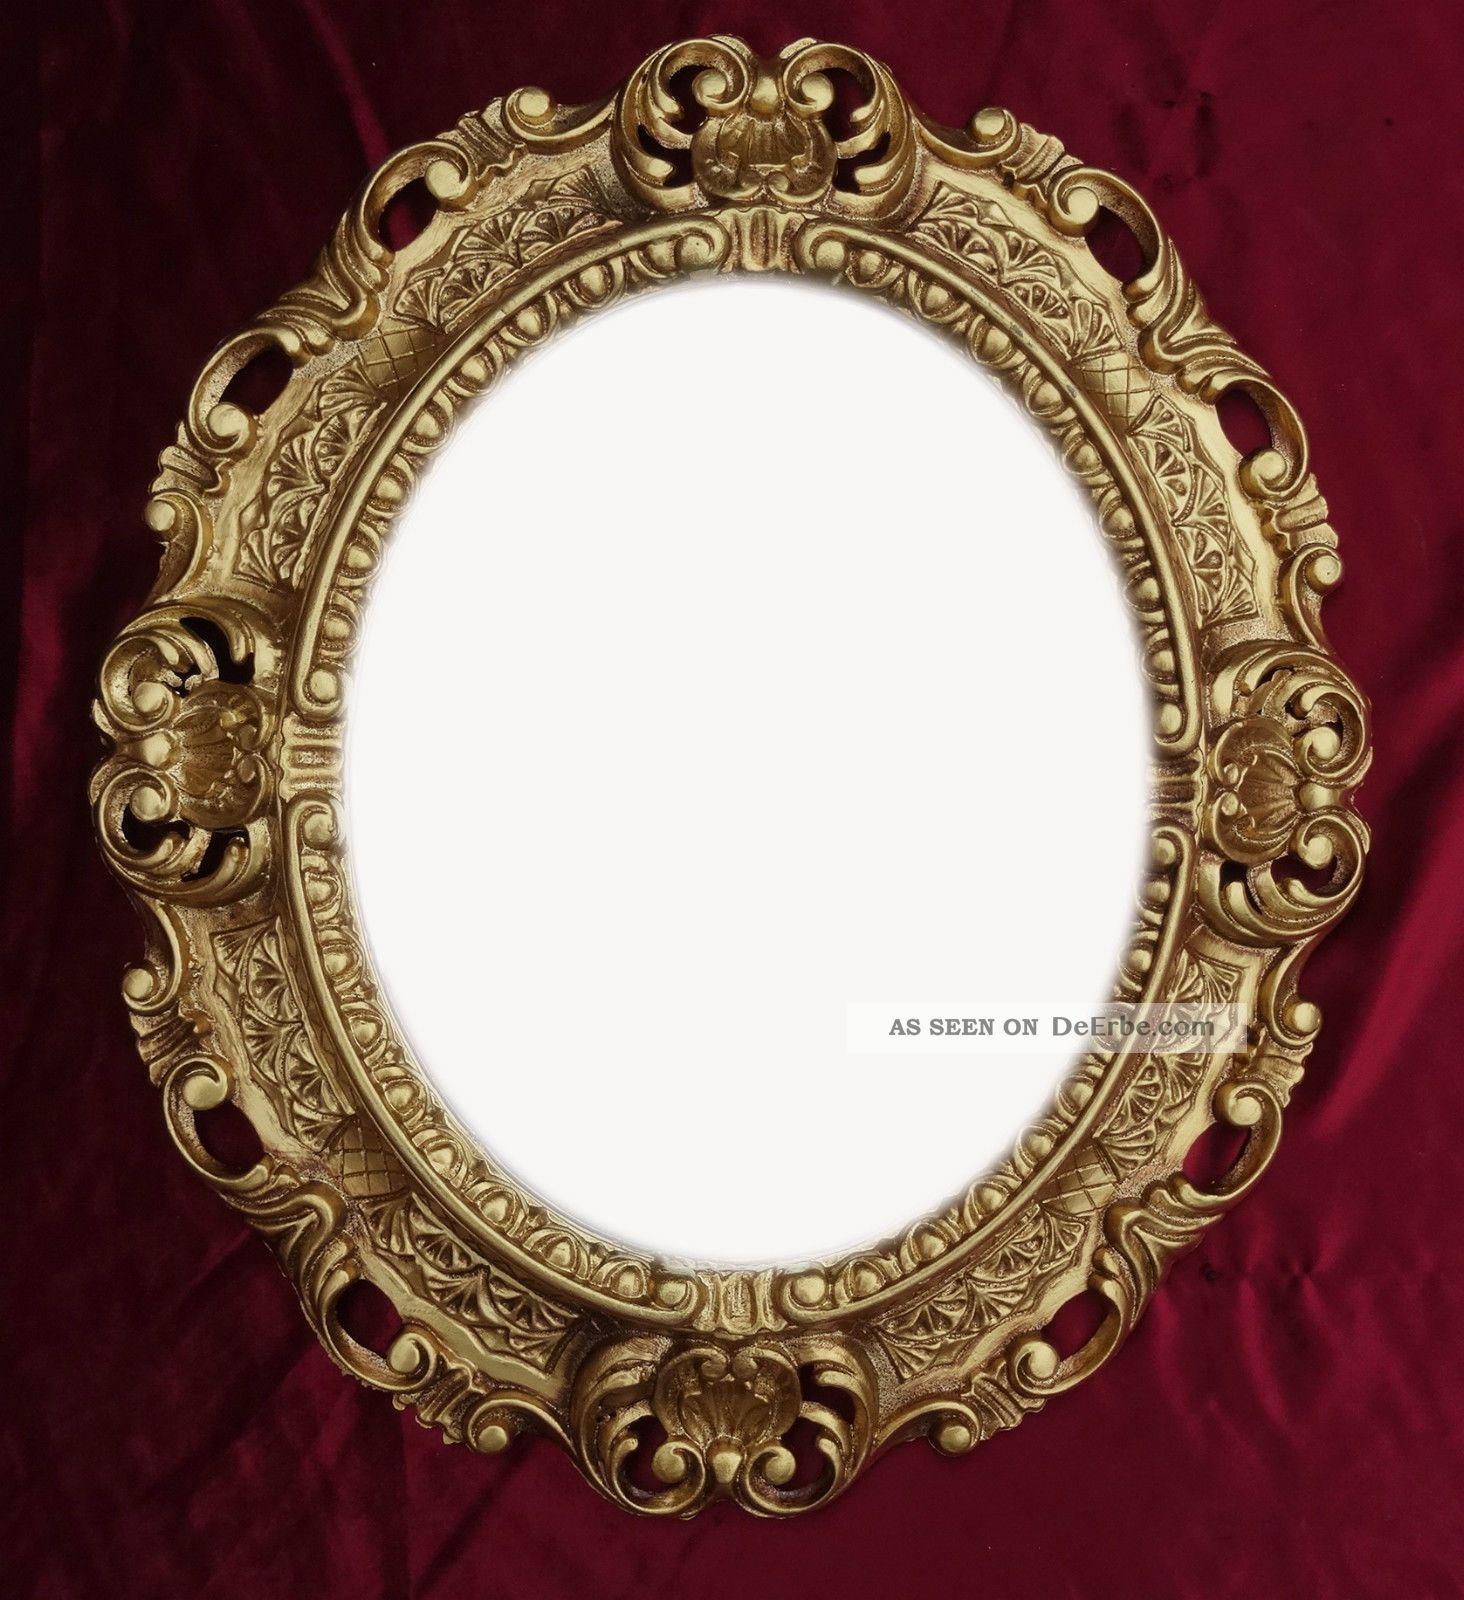 Wandspiegel spiegel in gold oval 45 x 38 cm barock antik repro vintage 345 3 - Spiegeldecoratie ...